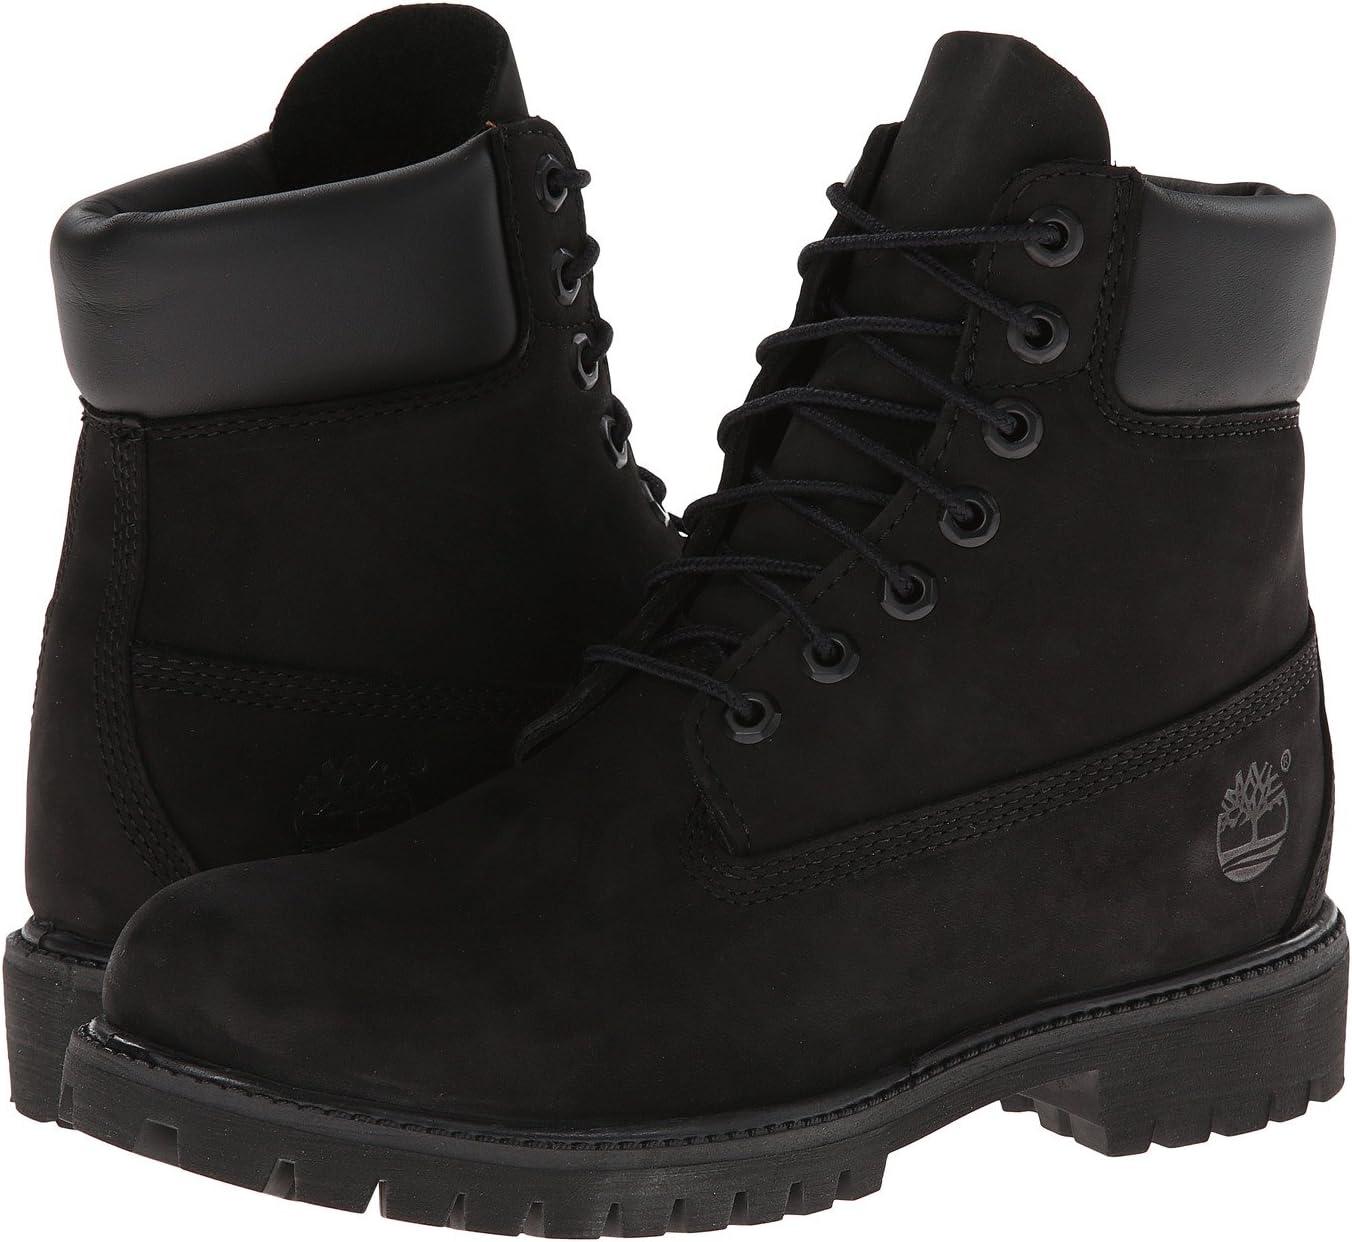 Timberland Boots, Shoes, \u0026 Apparel